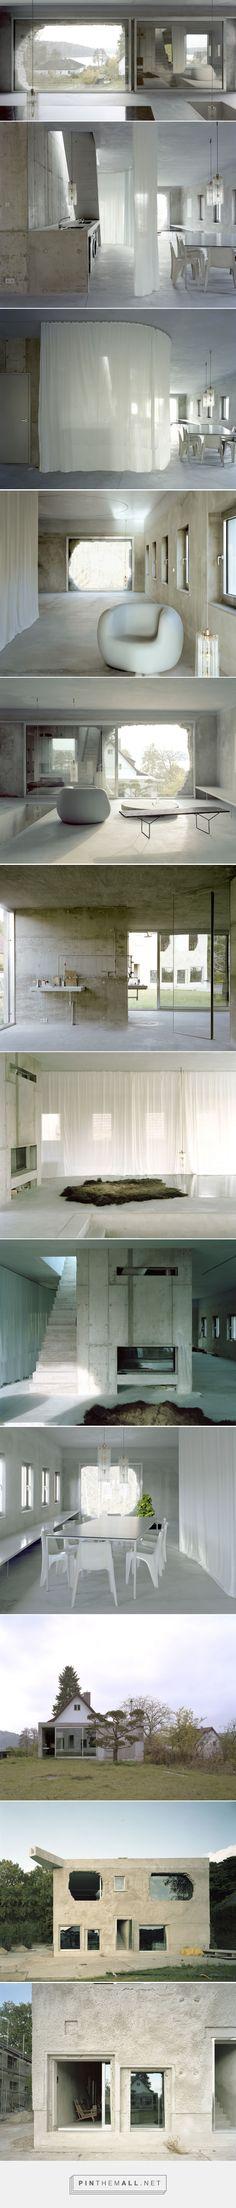 Antivilla, casa industriale moderna e minimalista a Berlino by Brandlhuber…